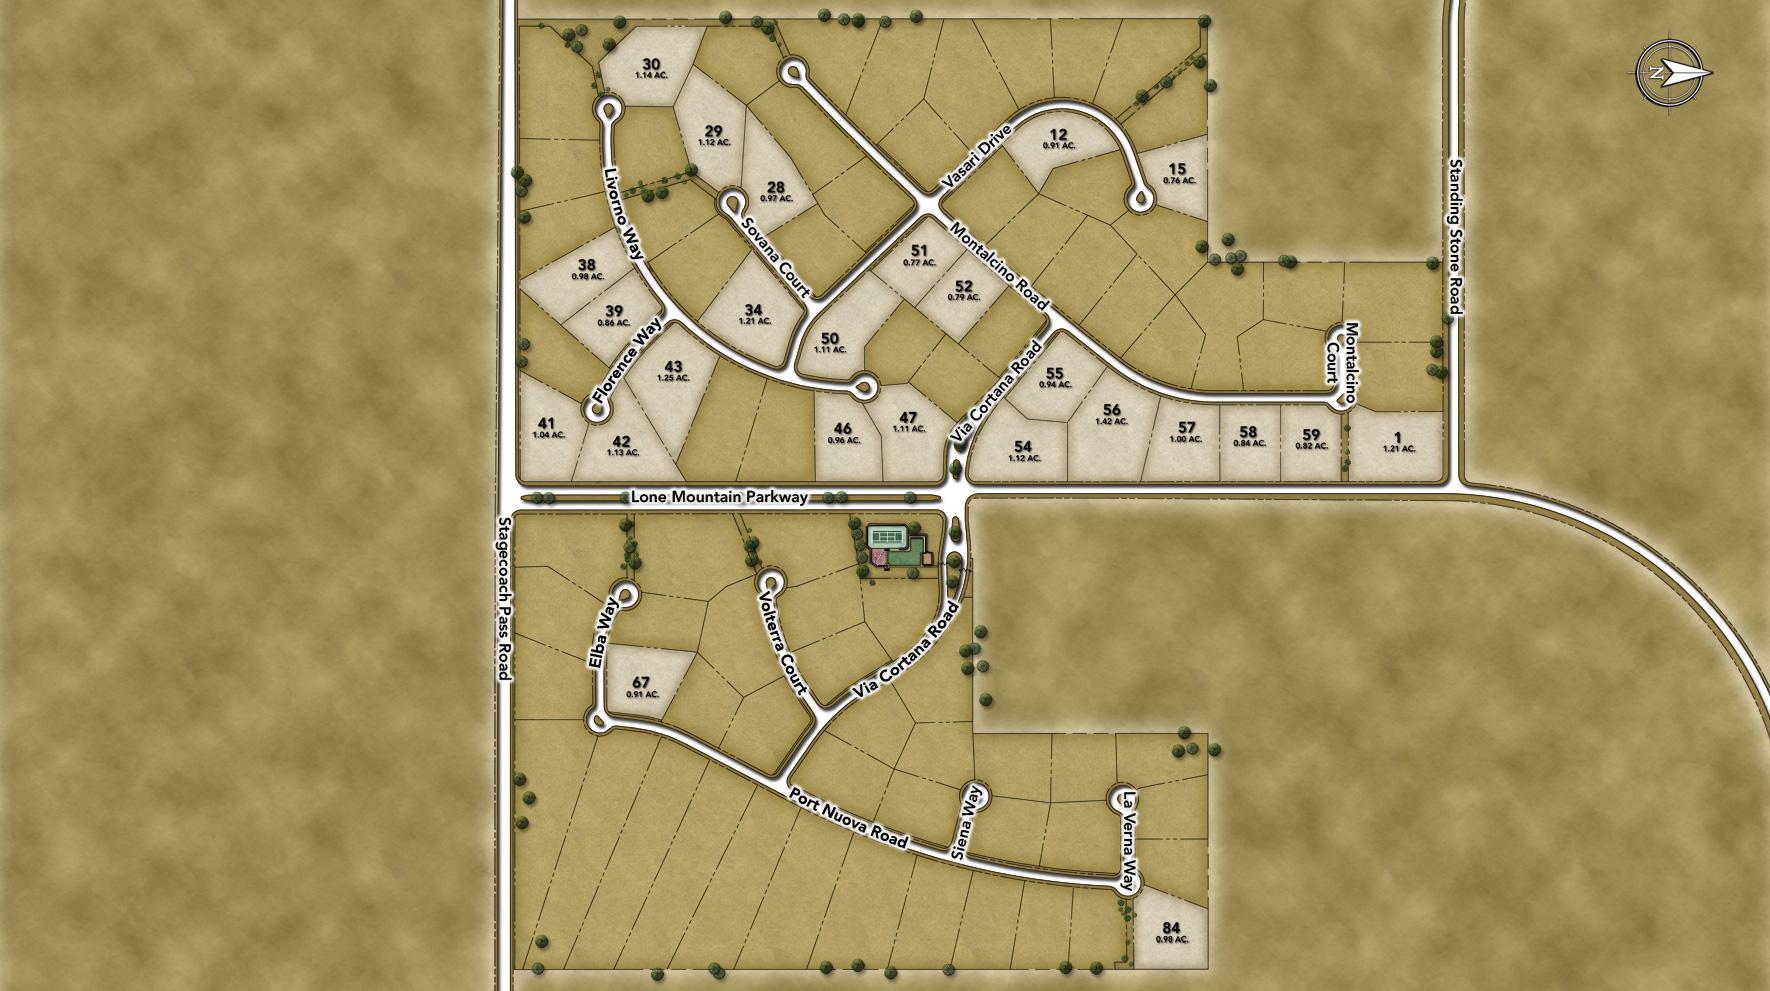 Treviso Site Plan